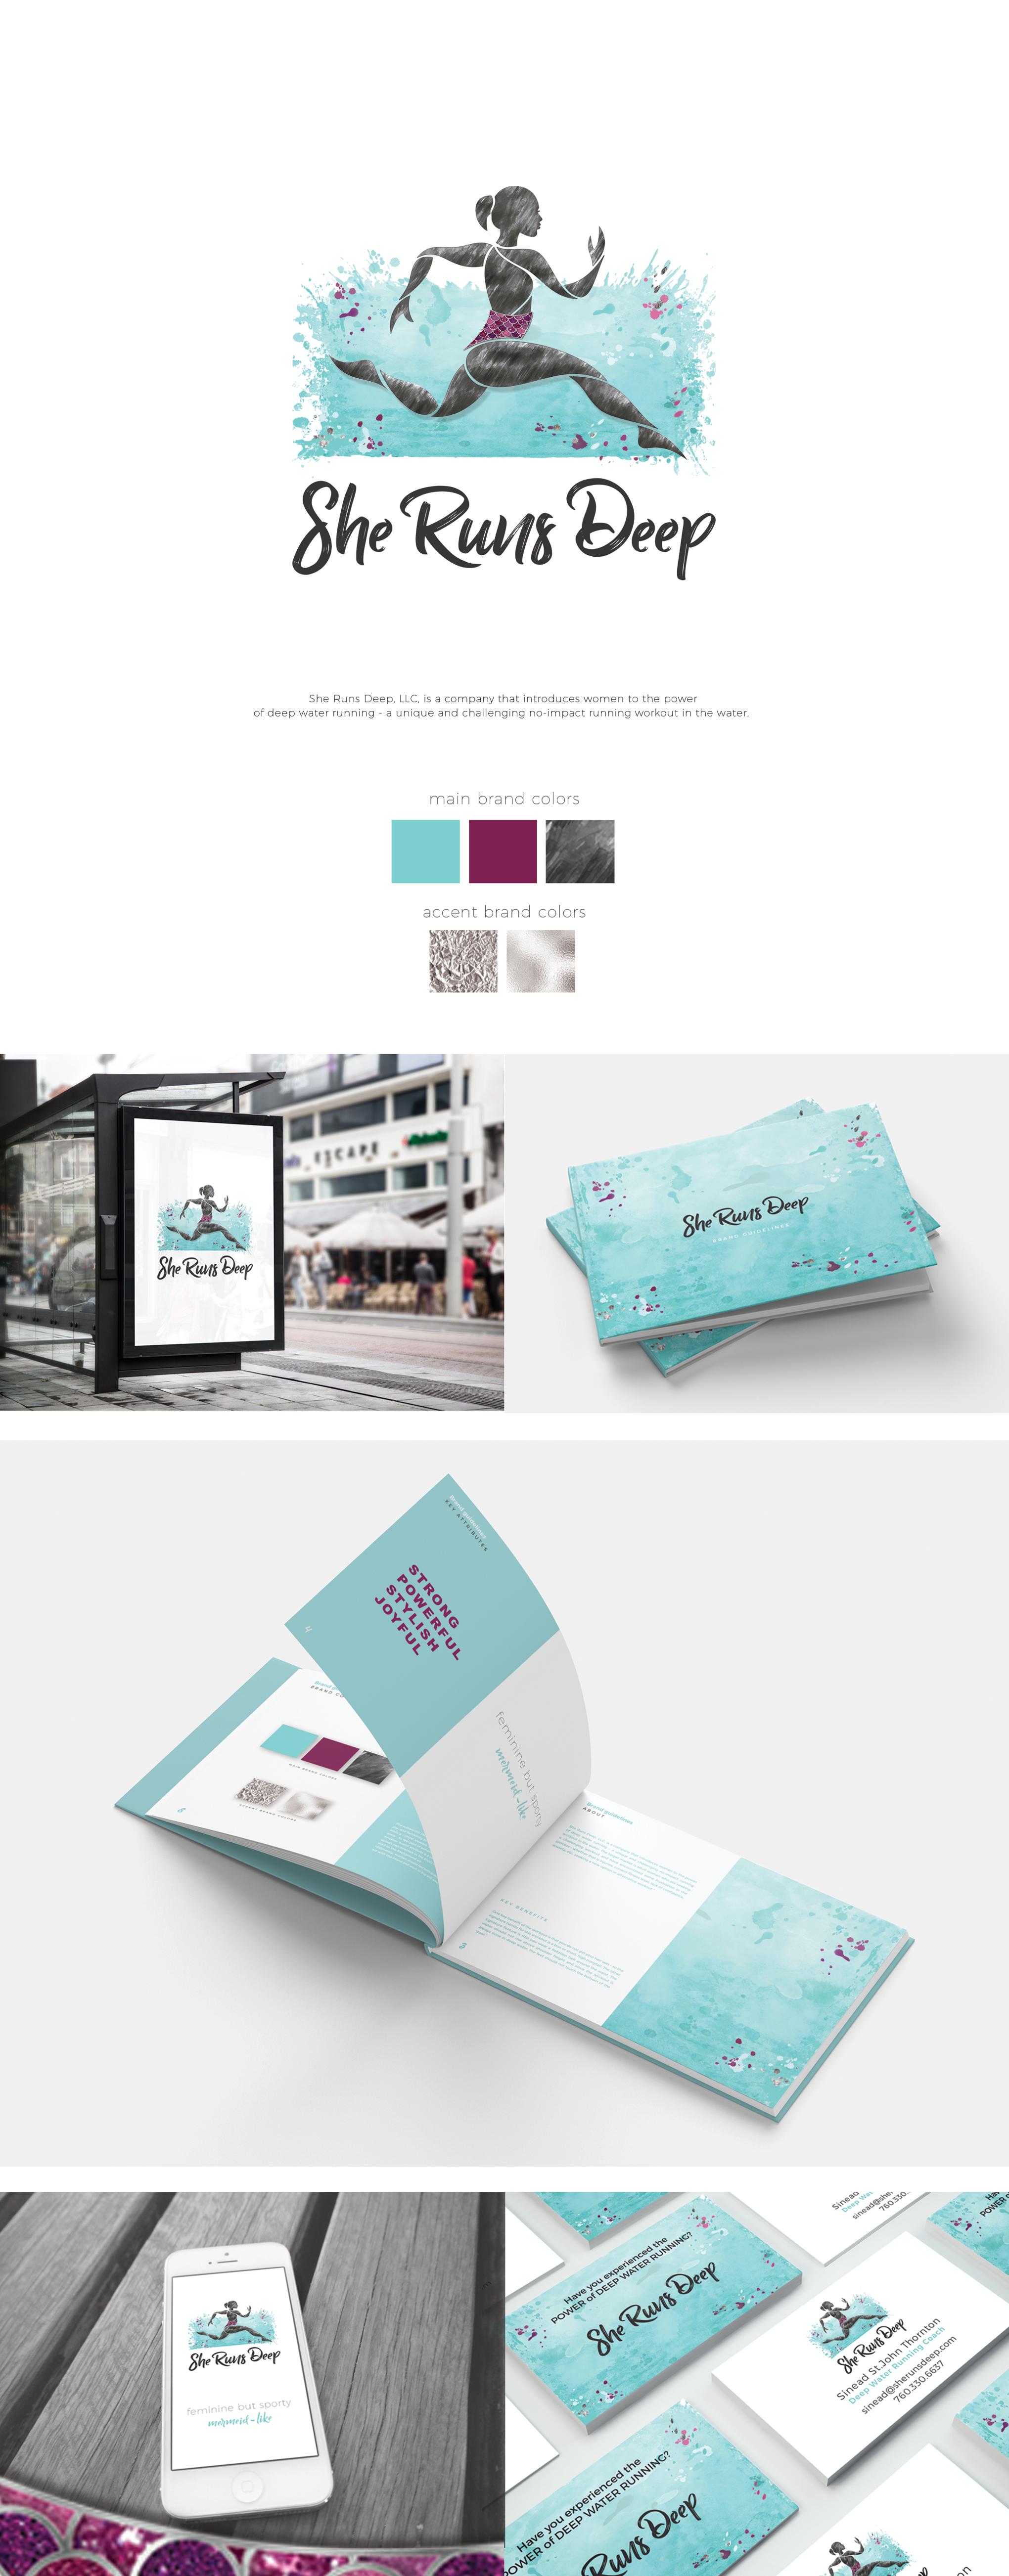 Brand Identity/Logo/BizCard for She Runs Deep